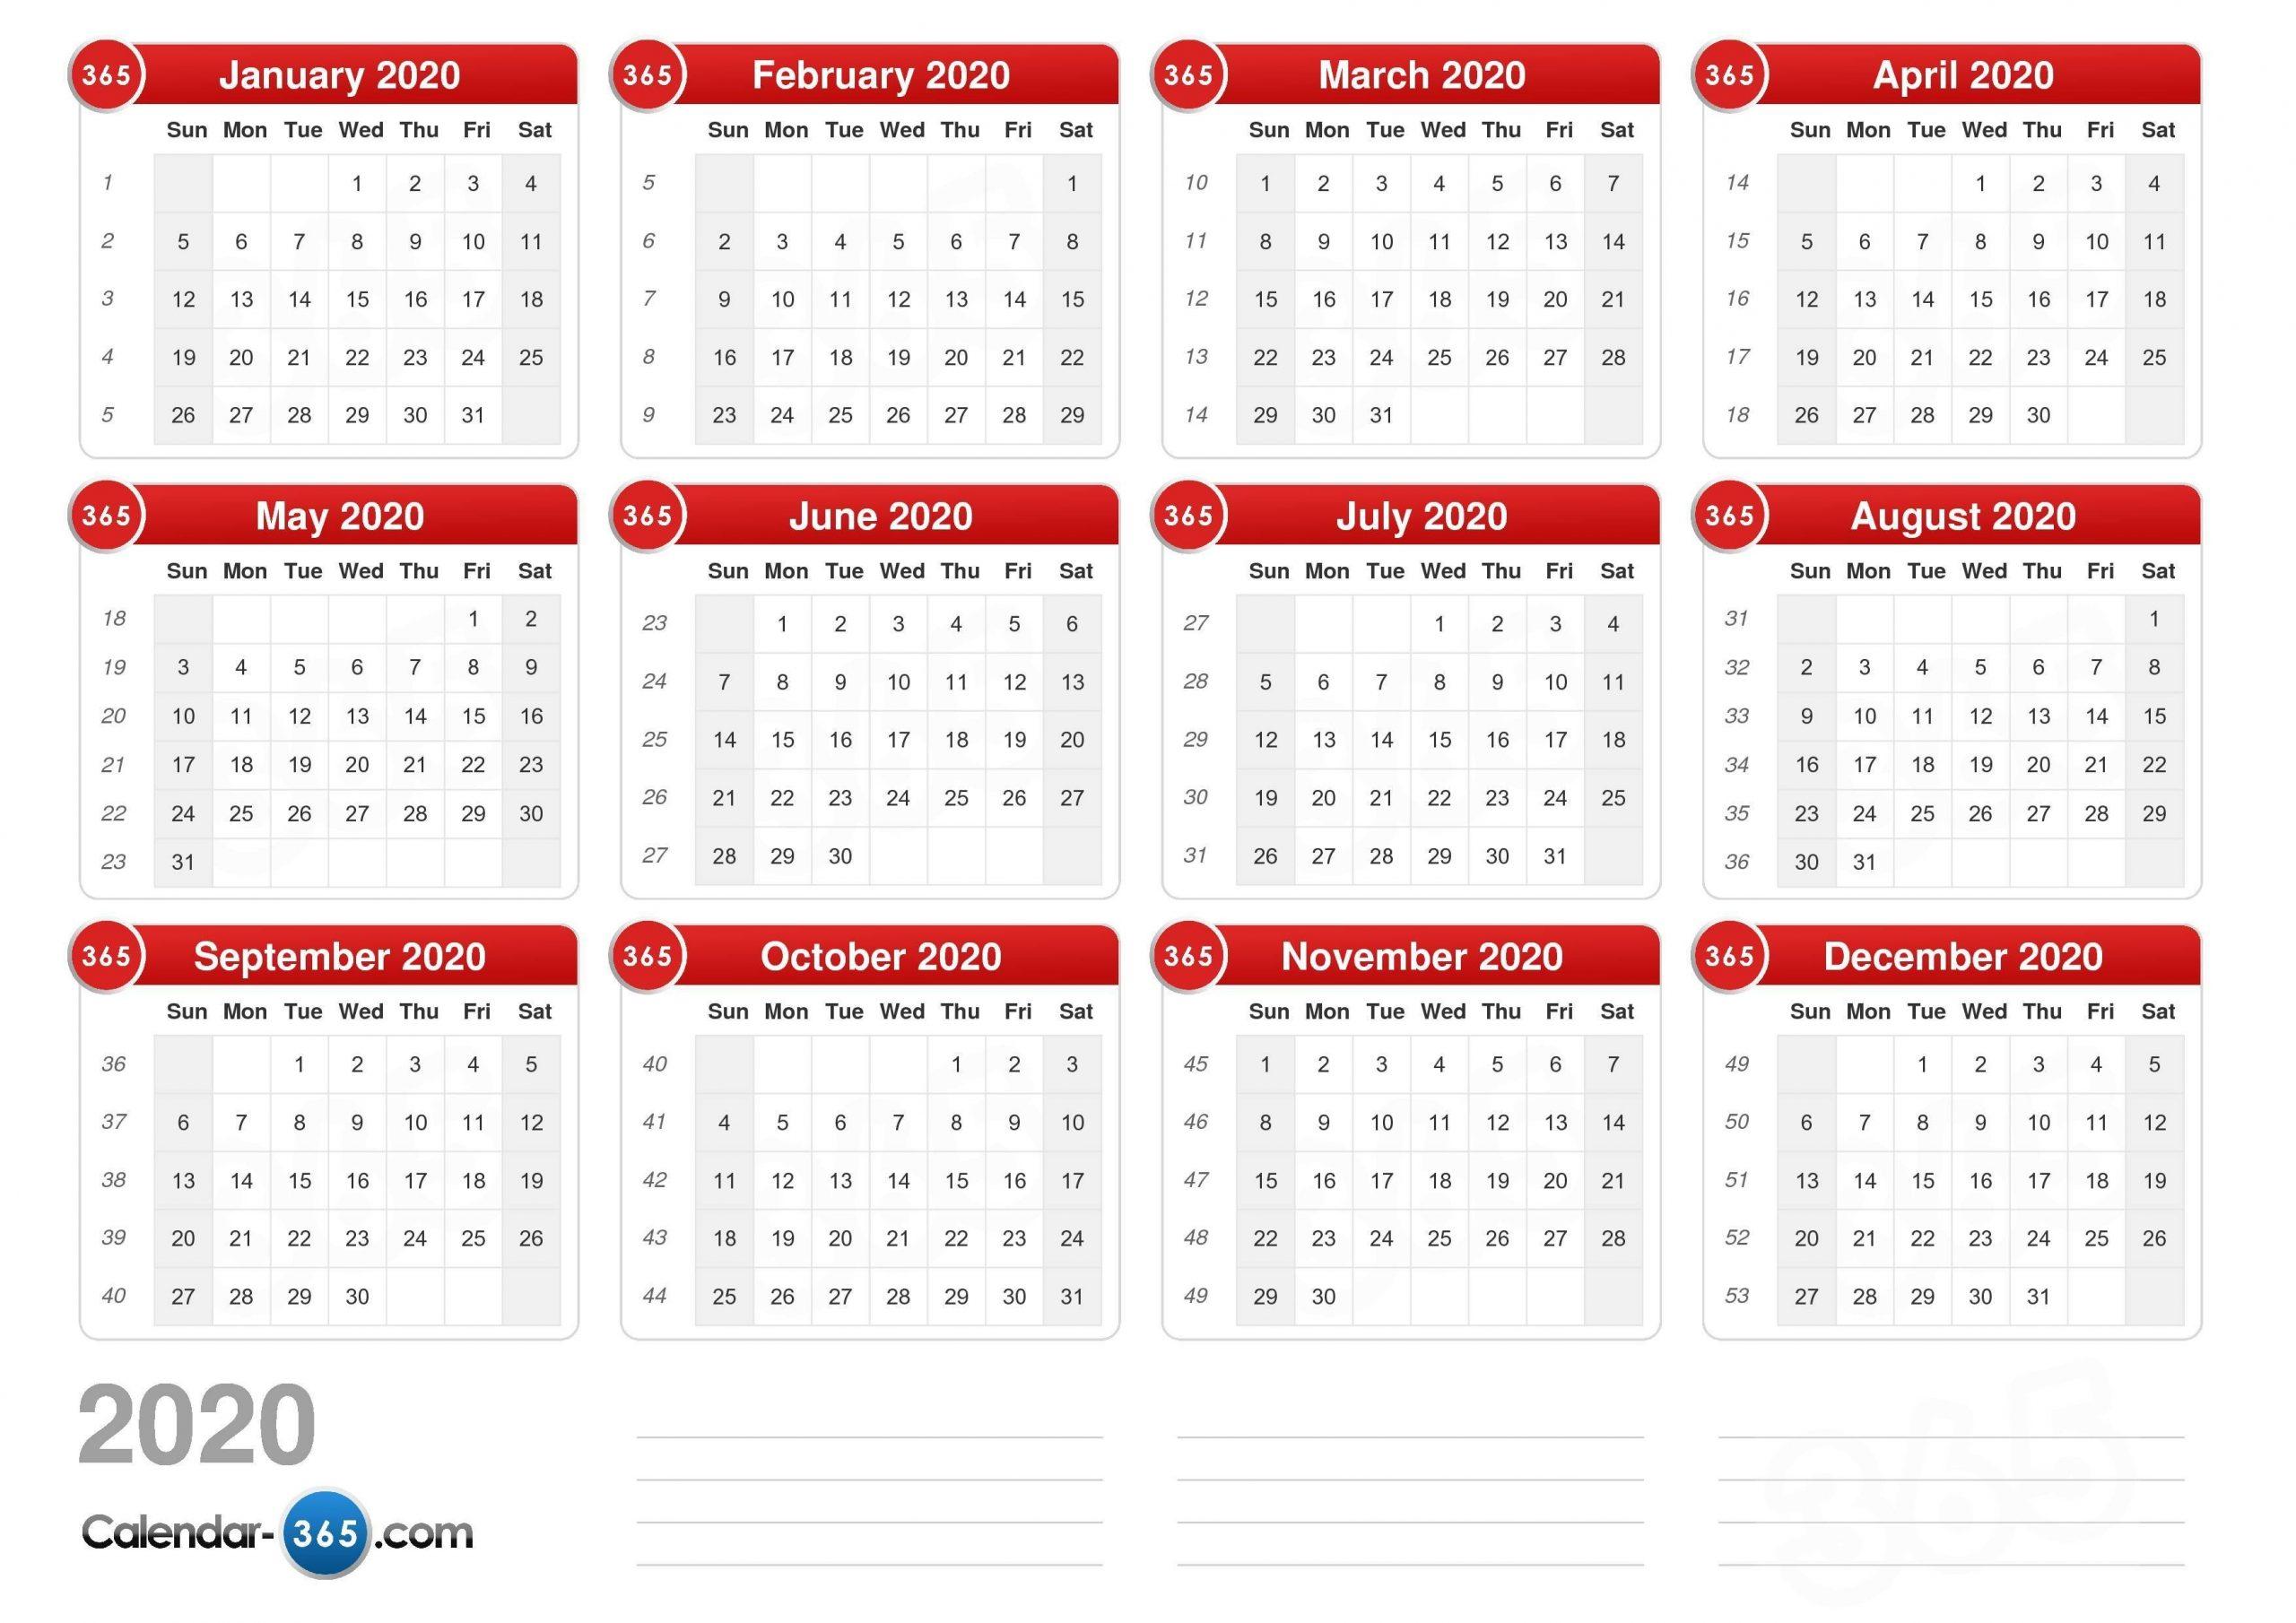 2020 Calendar-2021 Printable Calendar From October Thru December